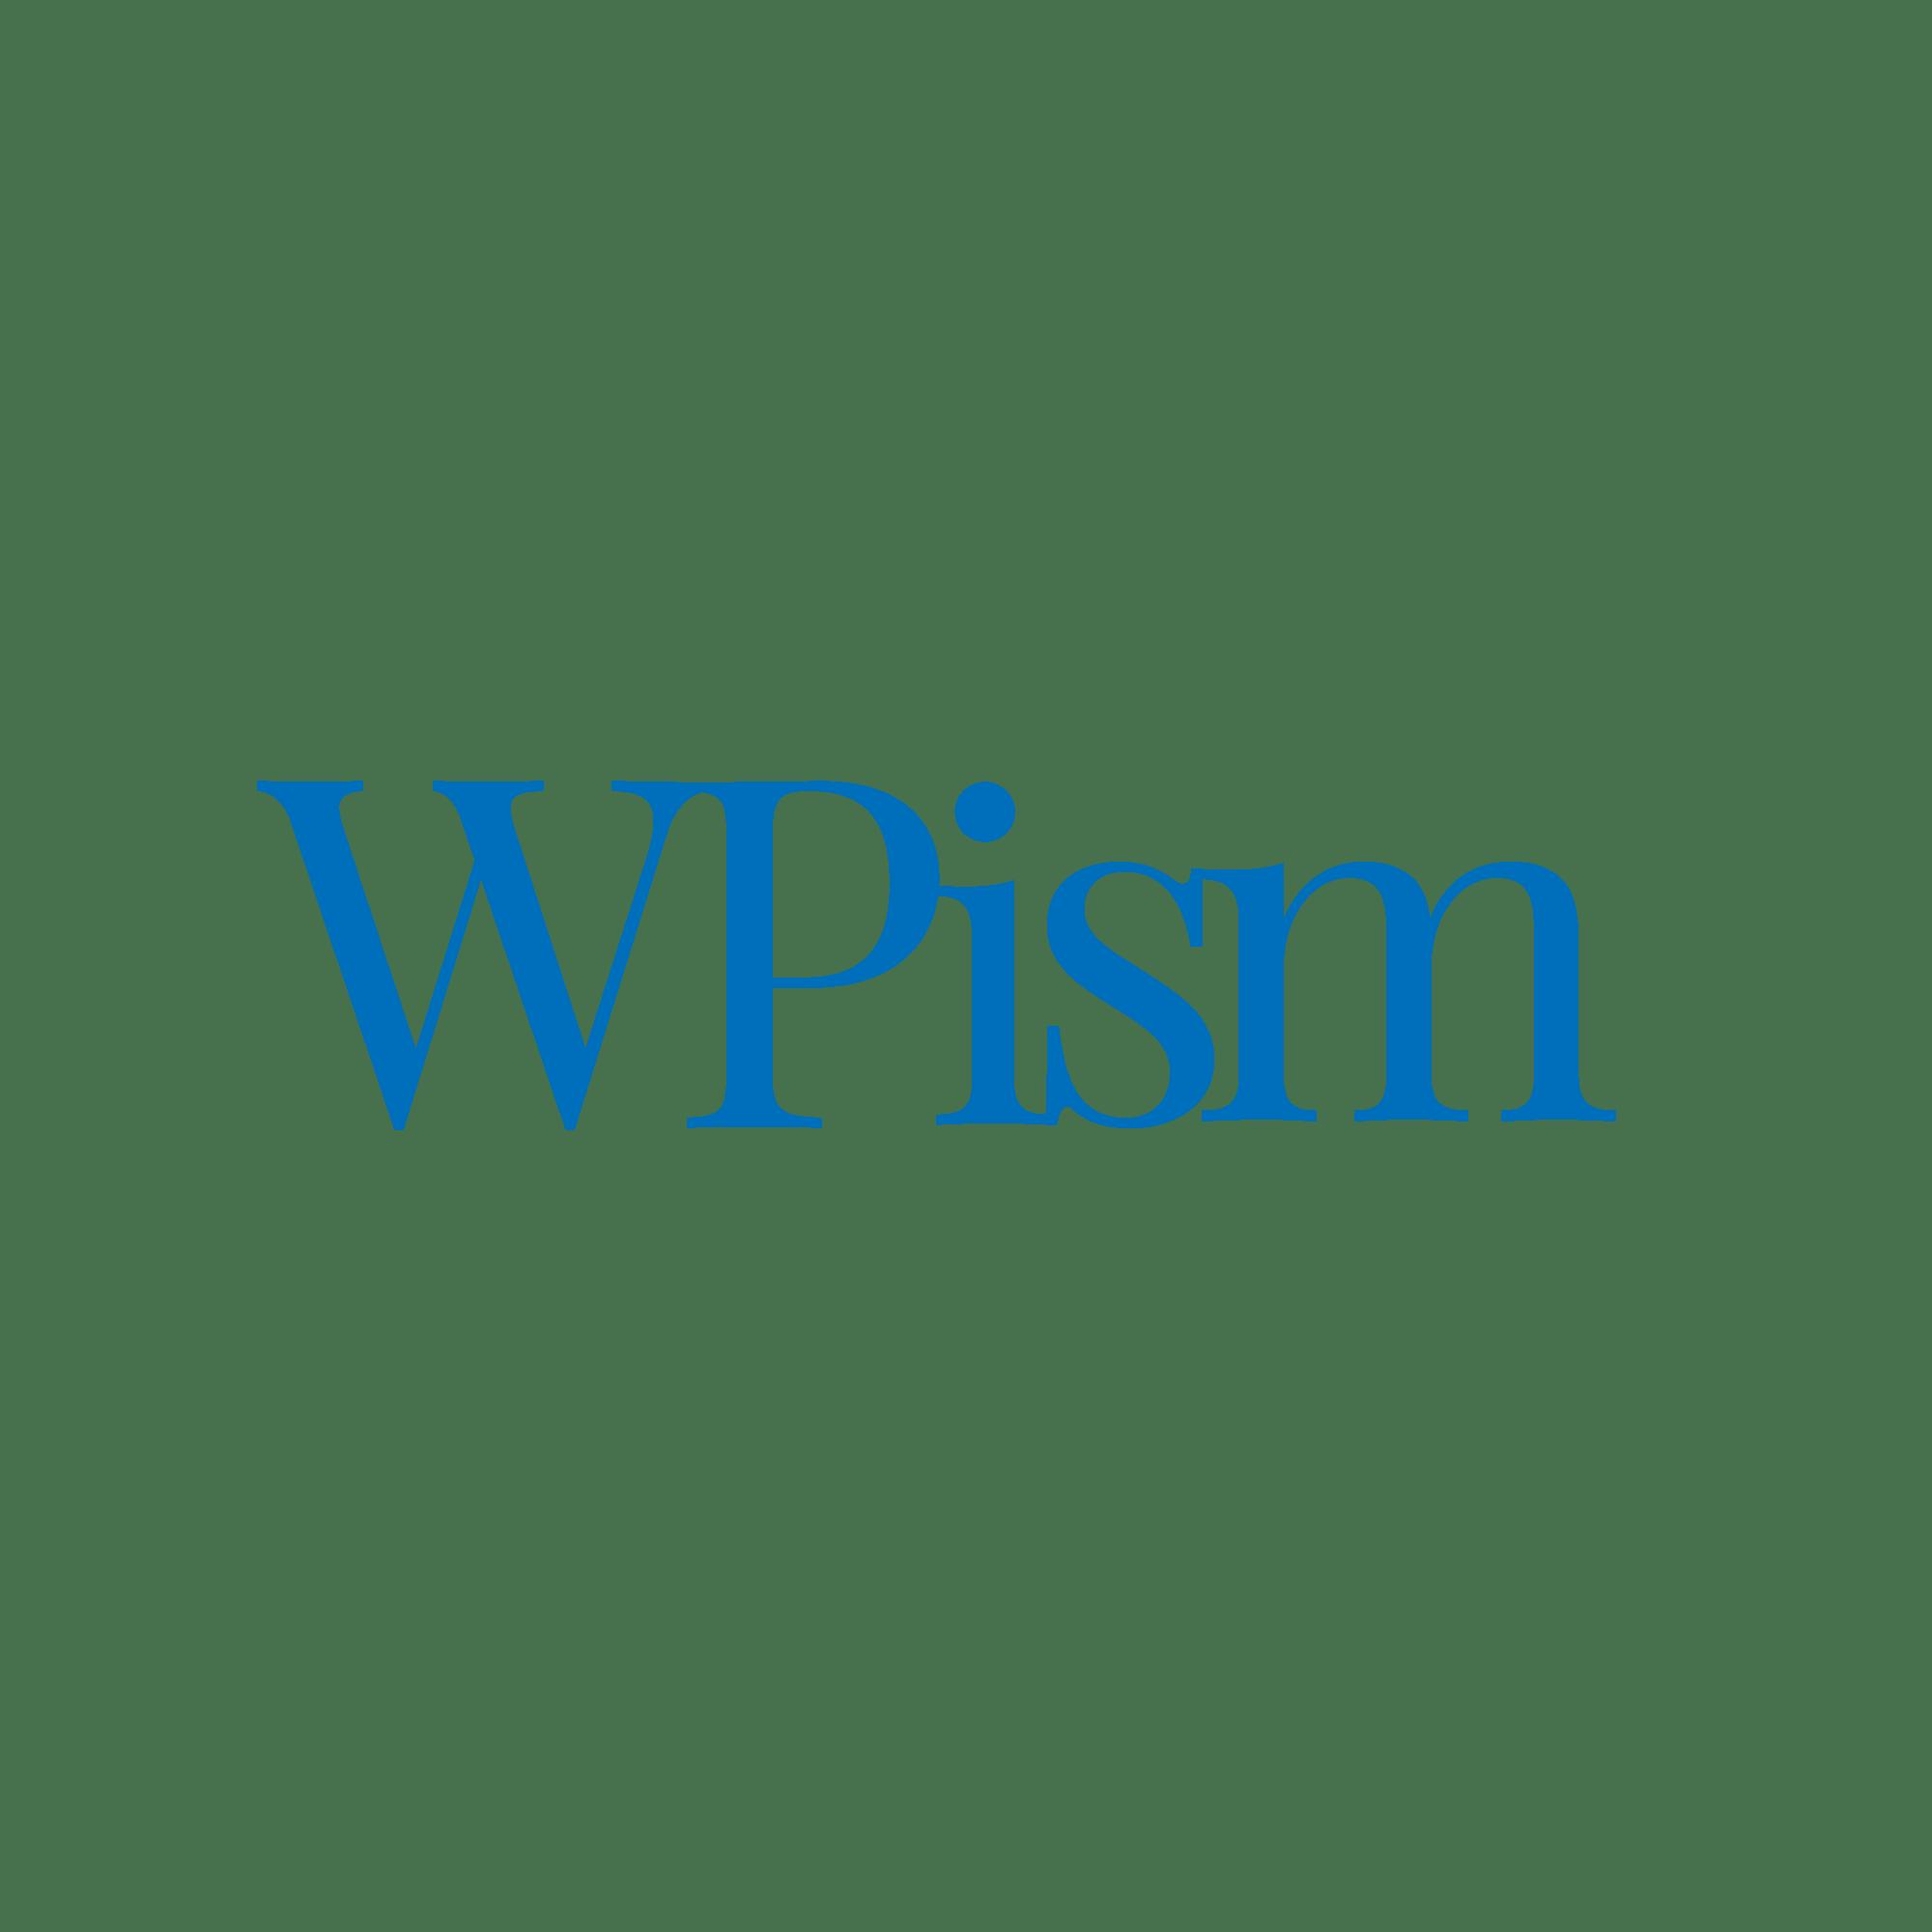 WPism-Square-Logo-Transparent-Background